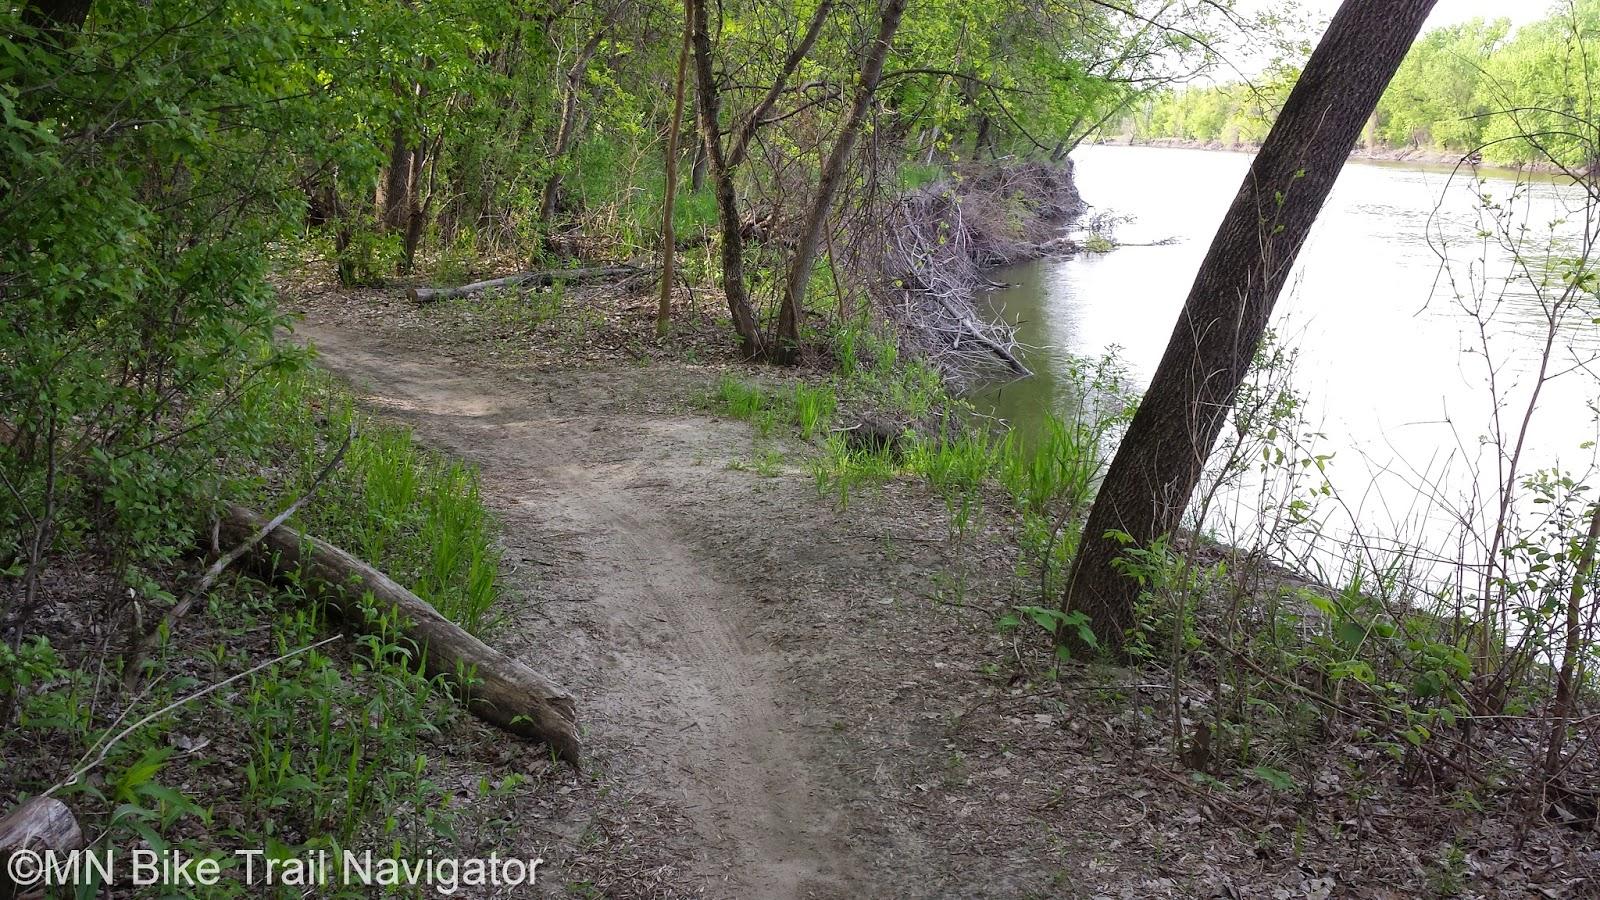 MN Bike Trail Navigator: Save the Minnesota River Bottoms